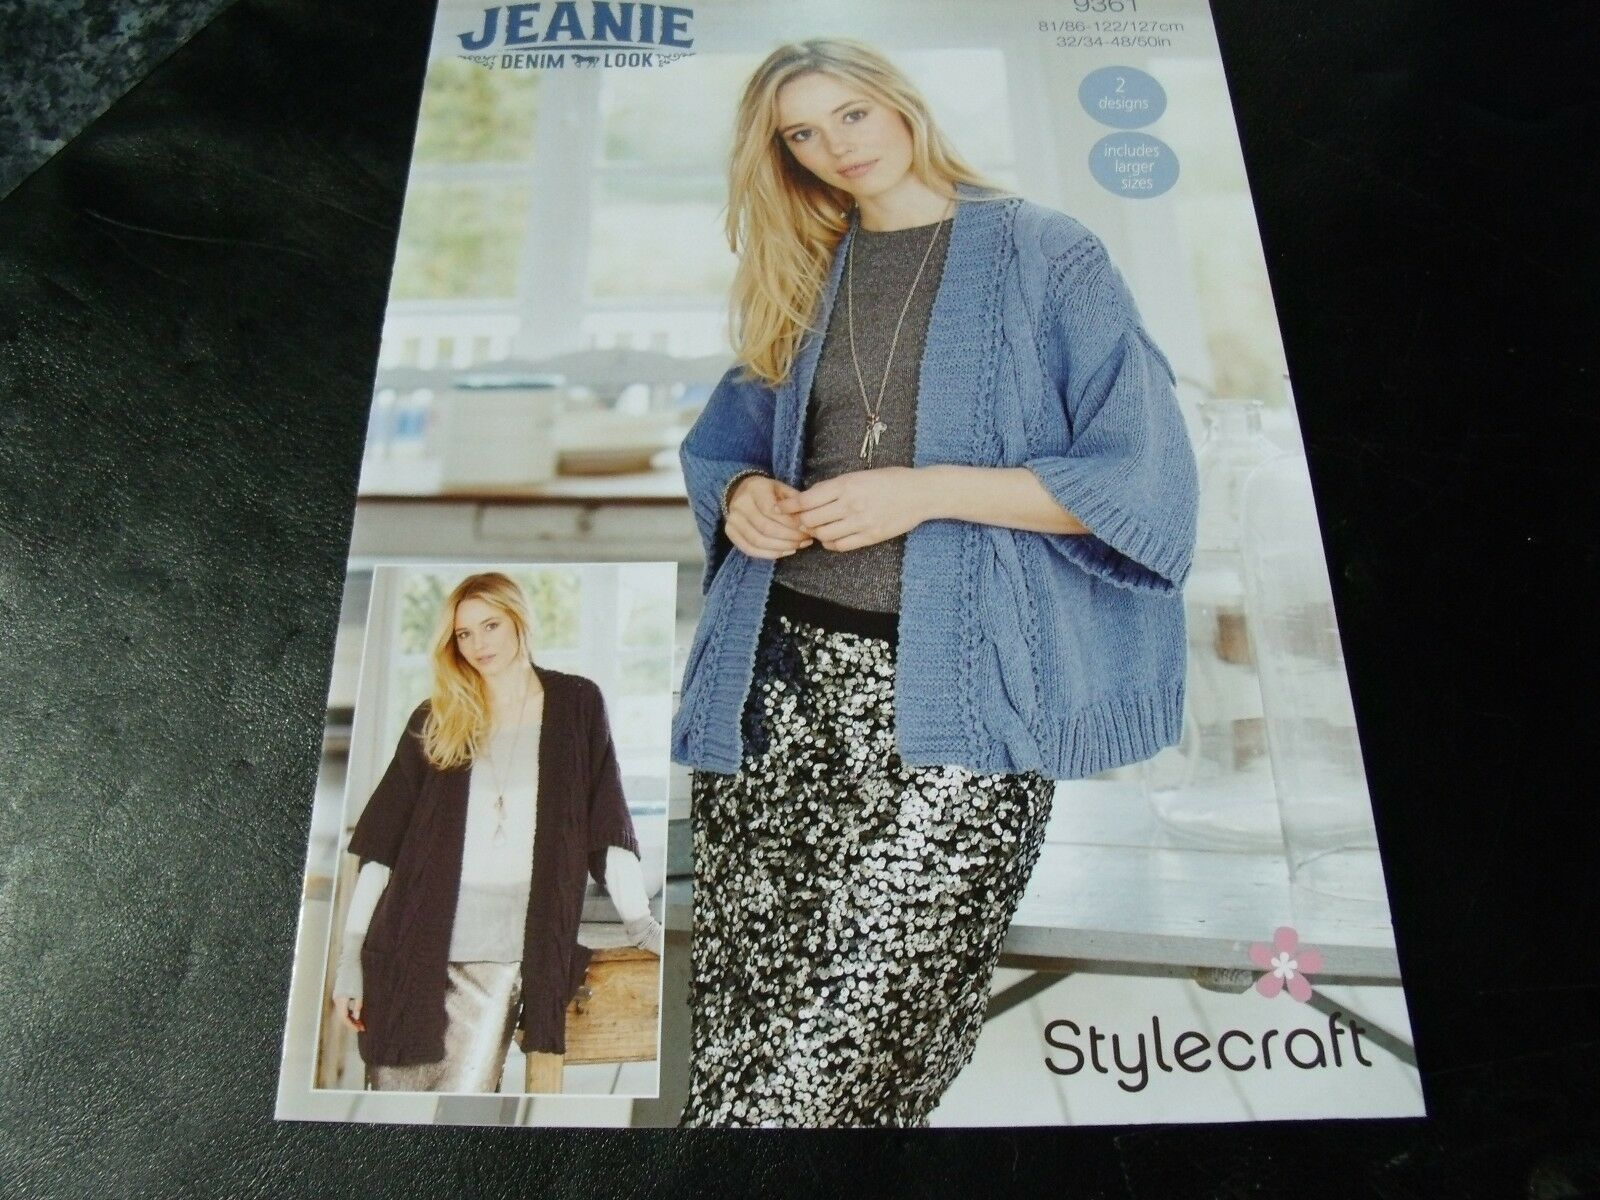 3debe5125eabe5 Stylecraft Jeanie Denim LOOK Jumper and Cardigan Pattern 9361 2 ...